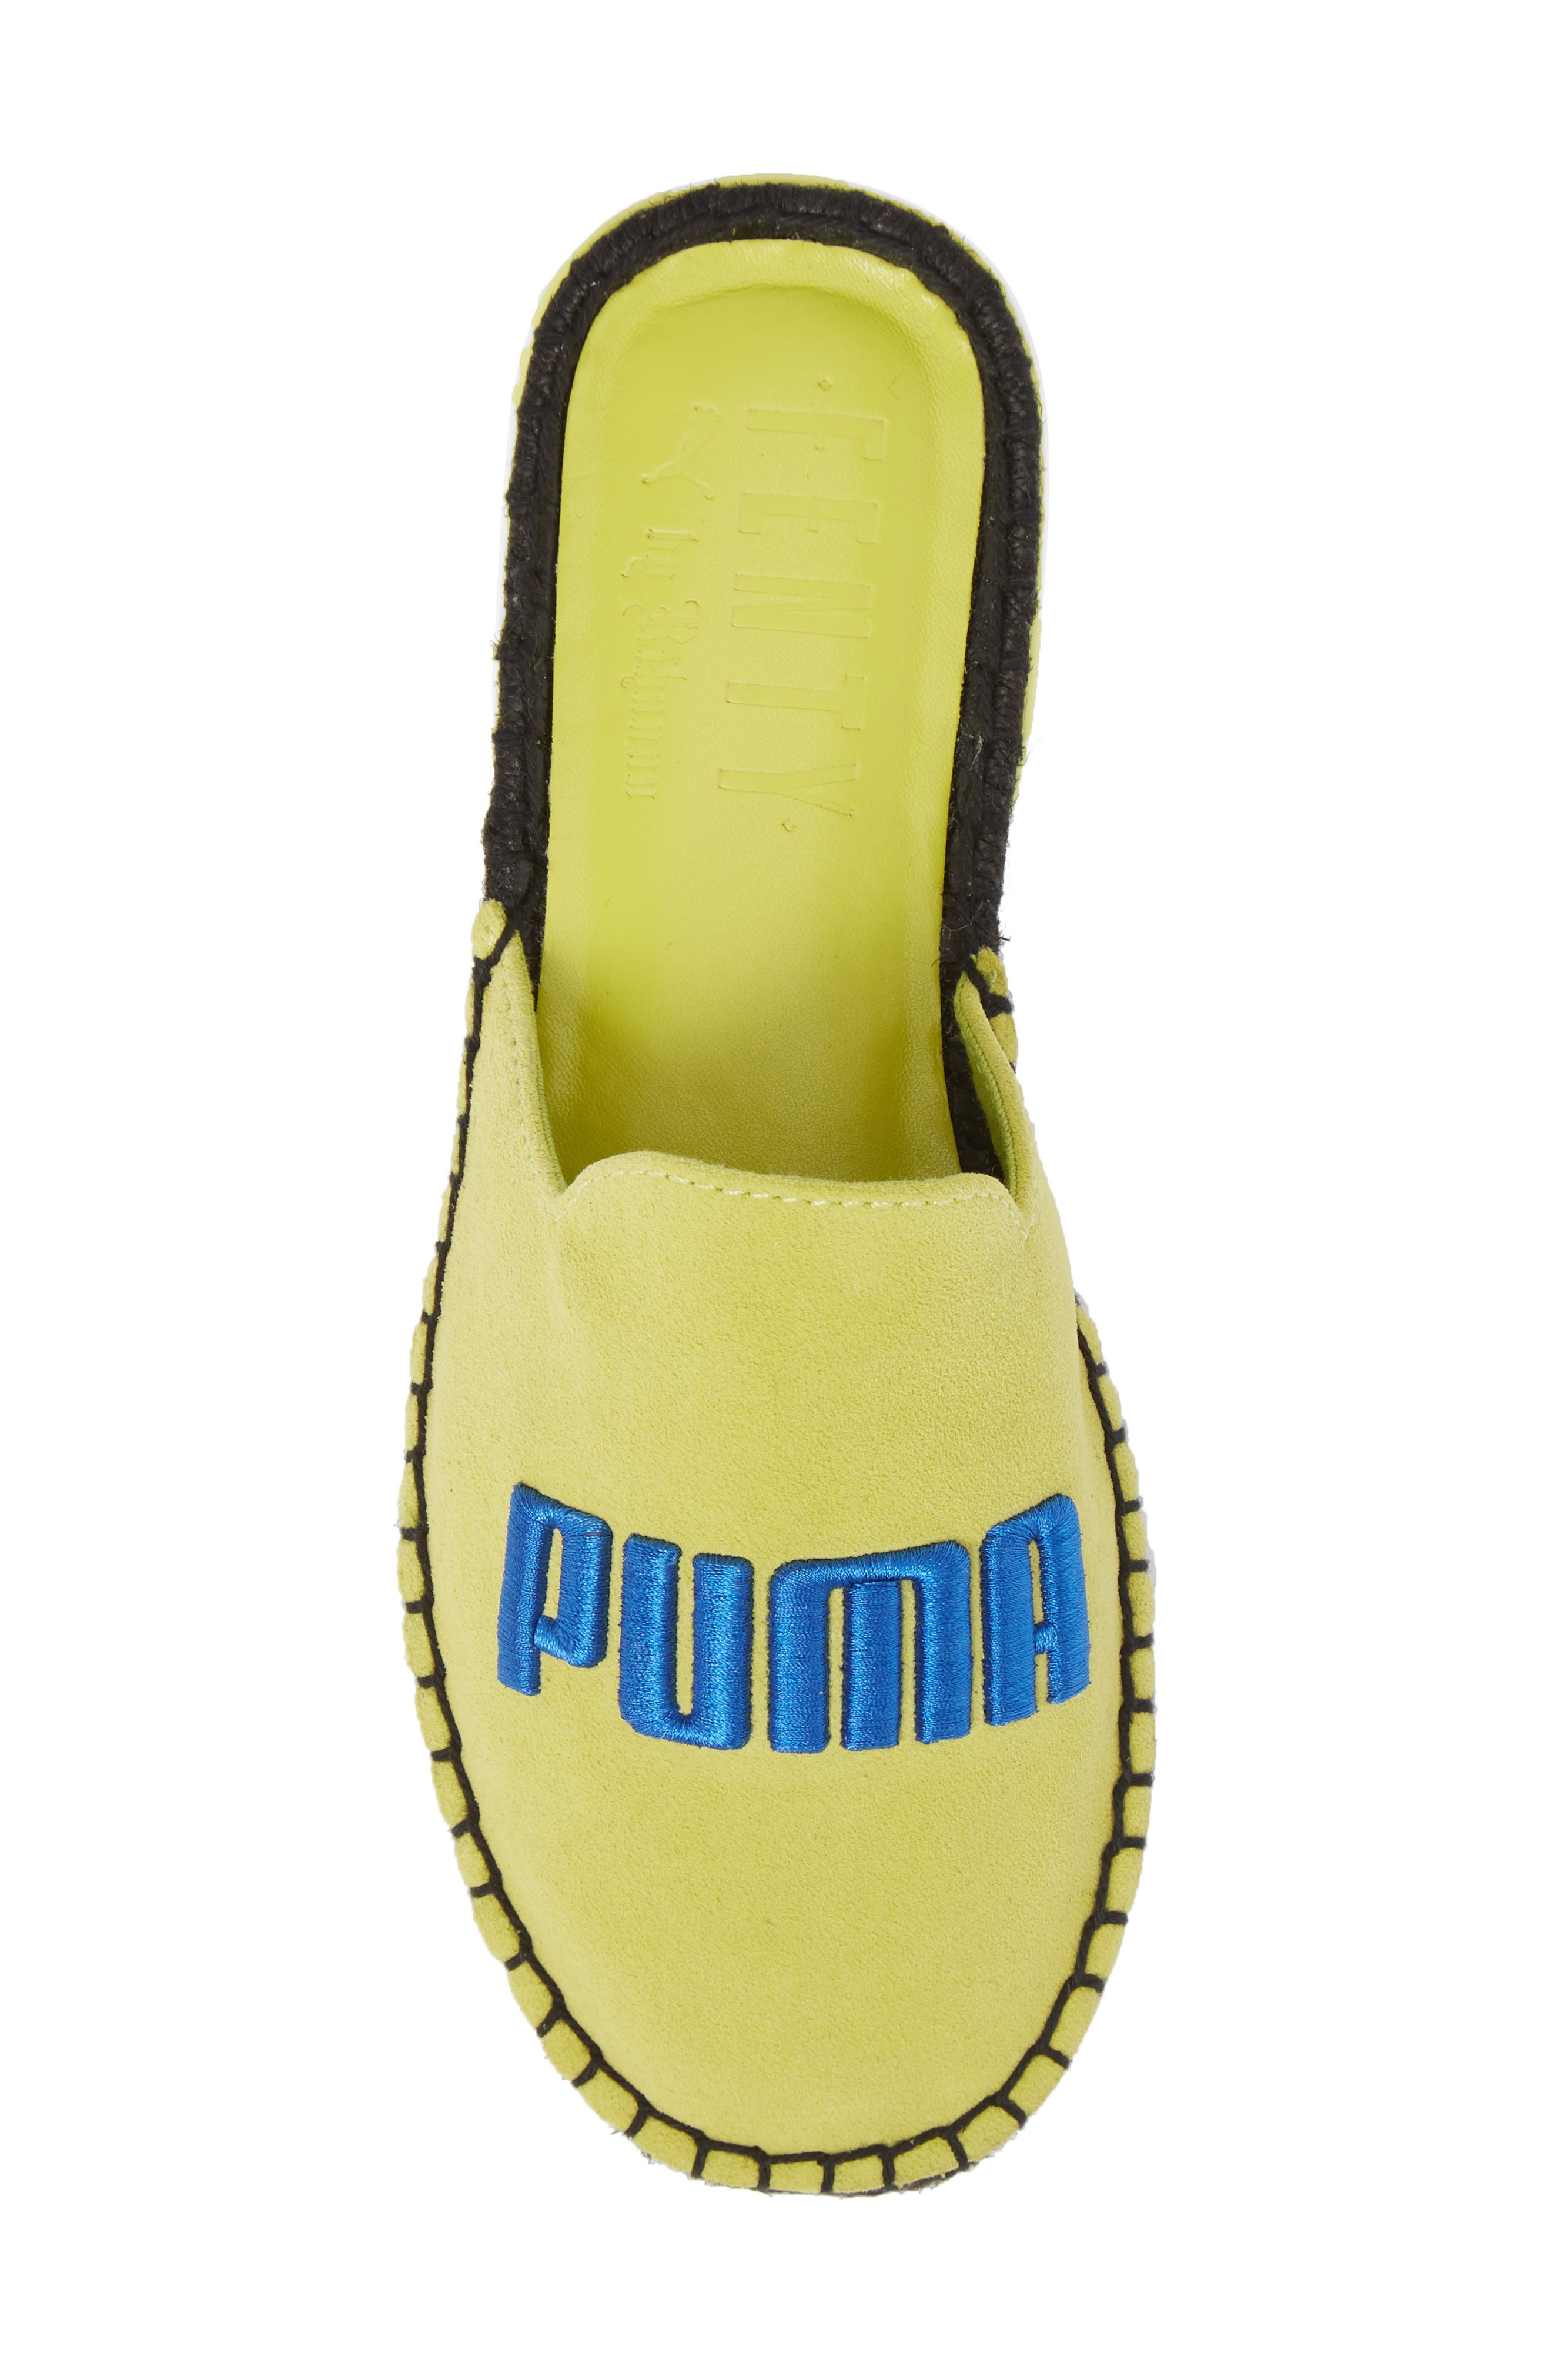 FENTY PUMA by Rihanna Espadrille Flat,                             Alternate thumbnail 5, color,                             Sulphur Spring/ Dazzling Blue